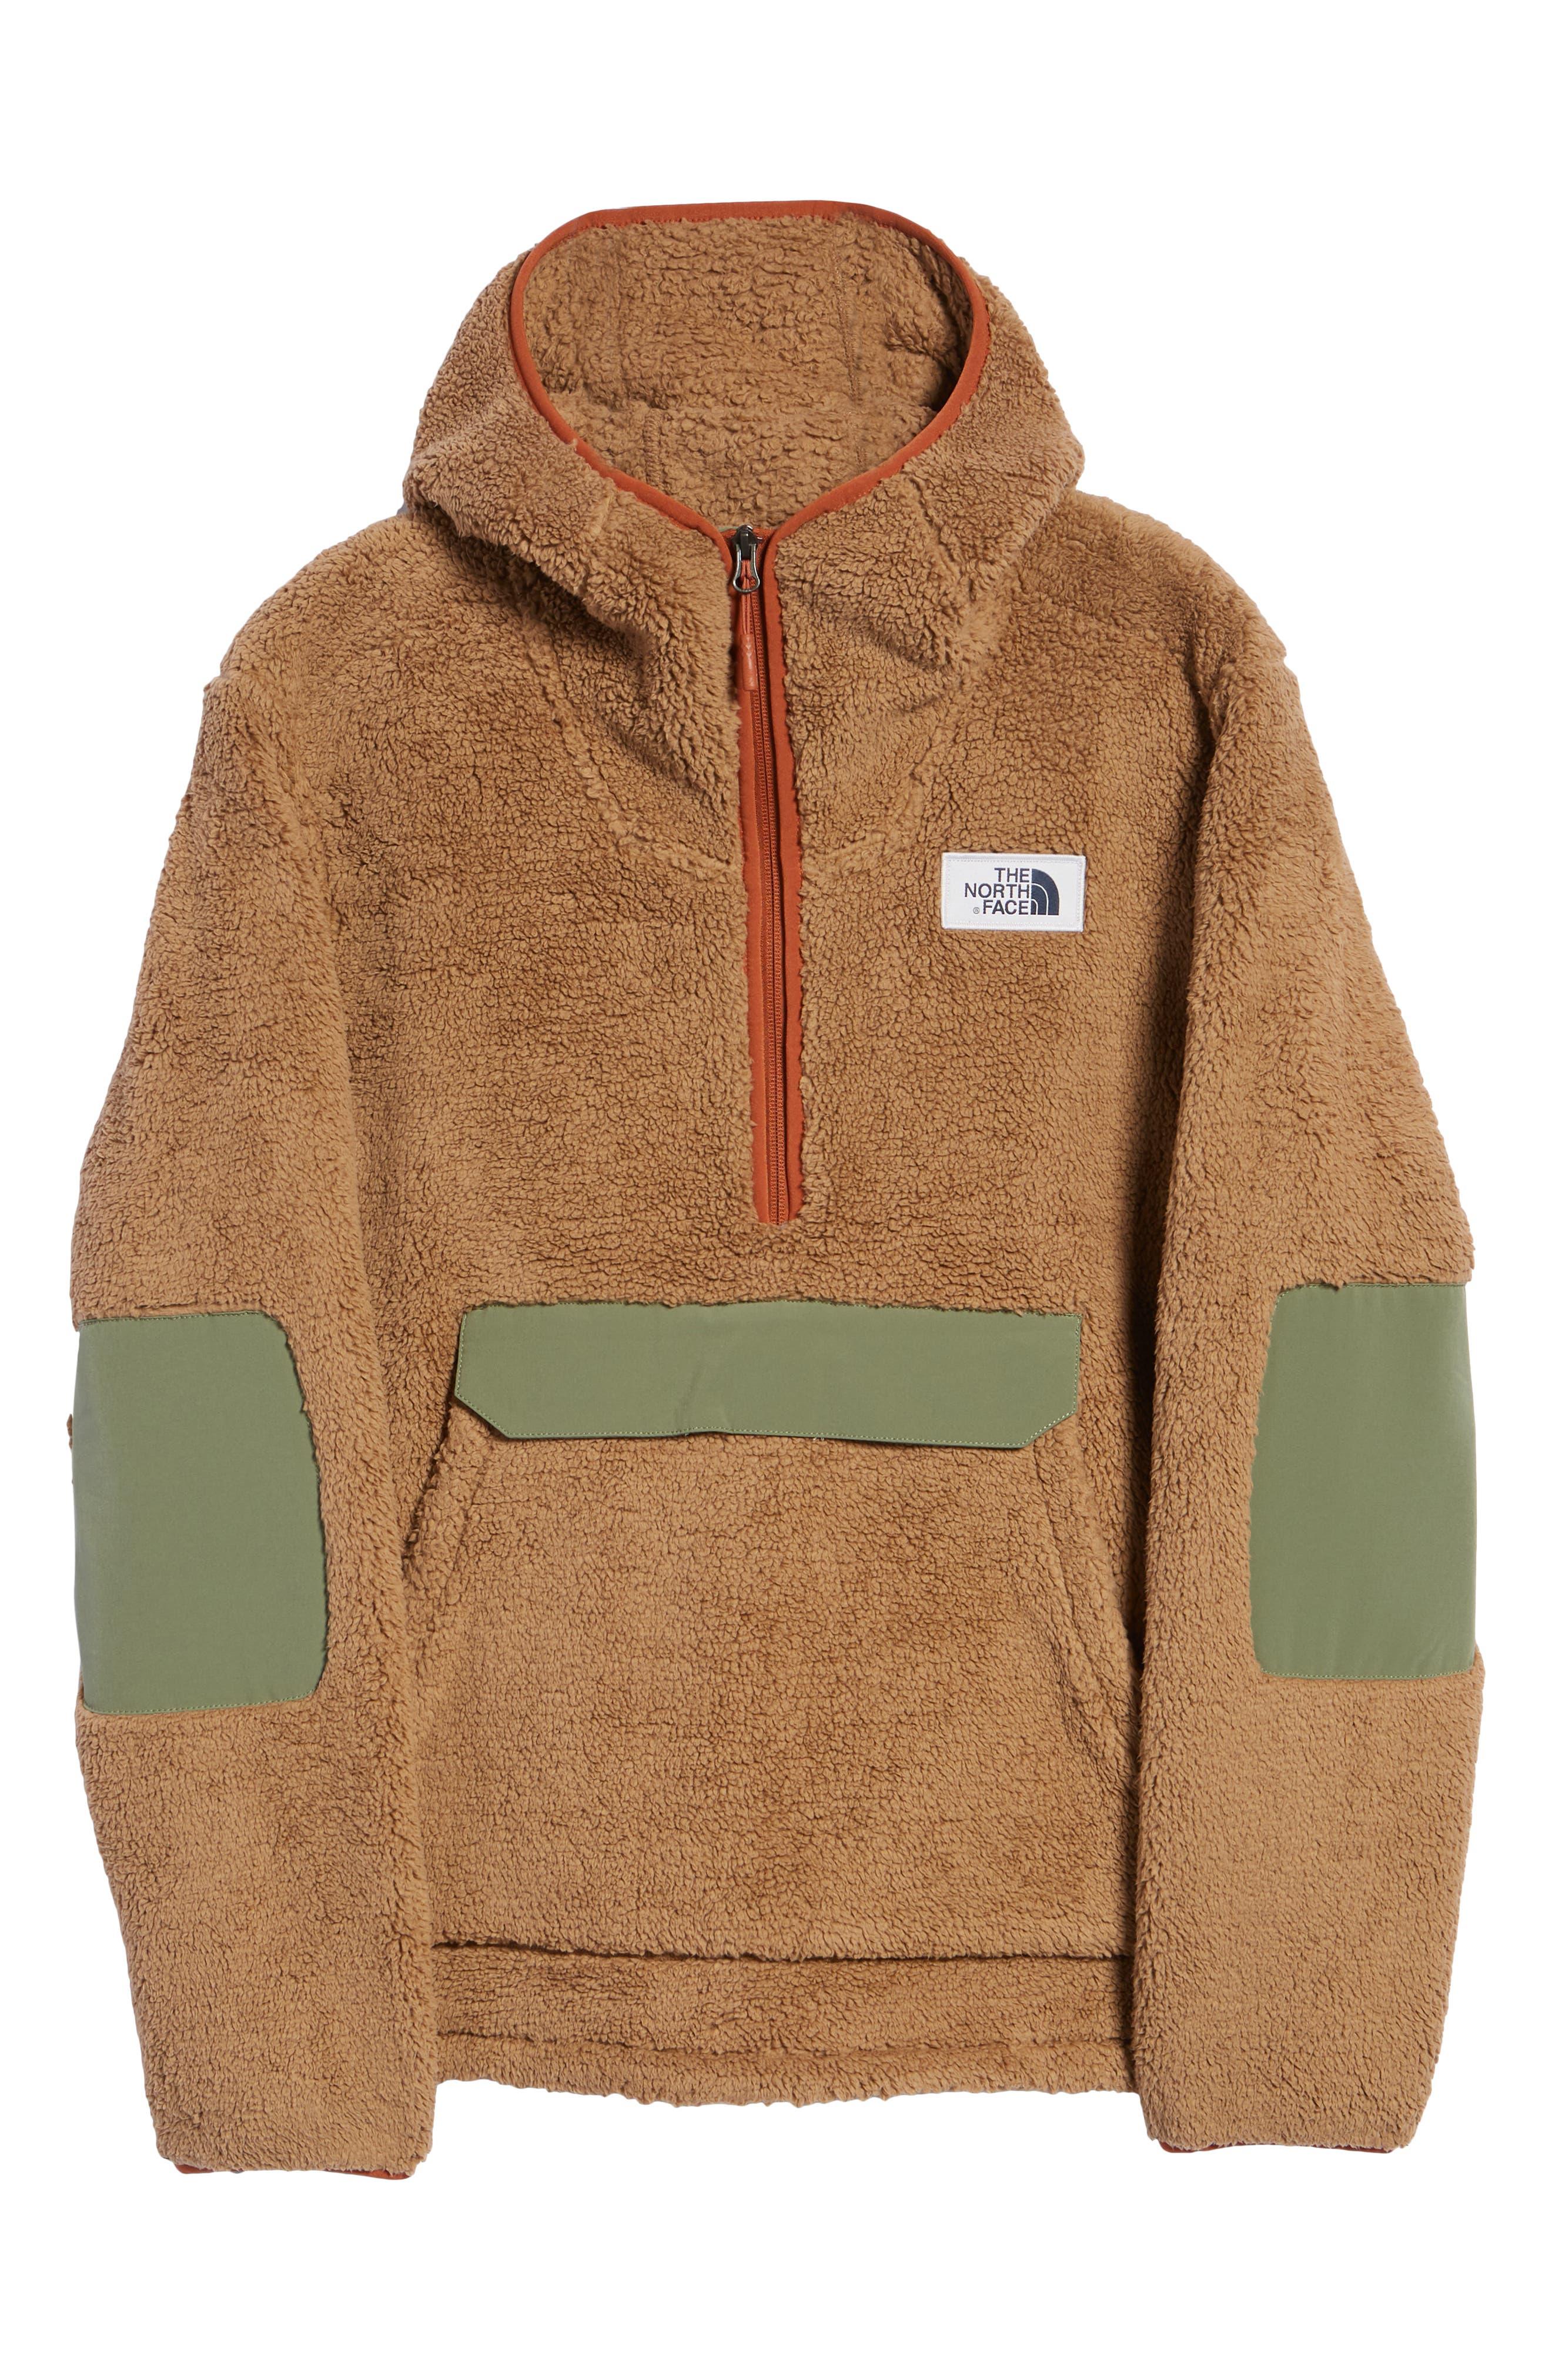 THE NORTH FACE,                             Campshire Anorak Fleece Jacket,                             Alternate thumbnail 7, color,                             CARGO KHAKI/ FOUR LEAF CLOVER